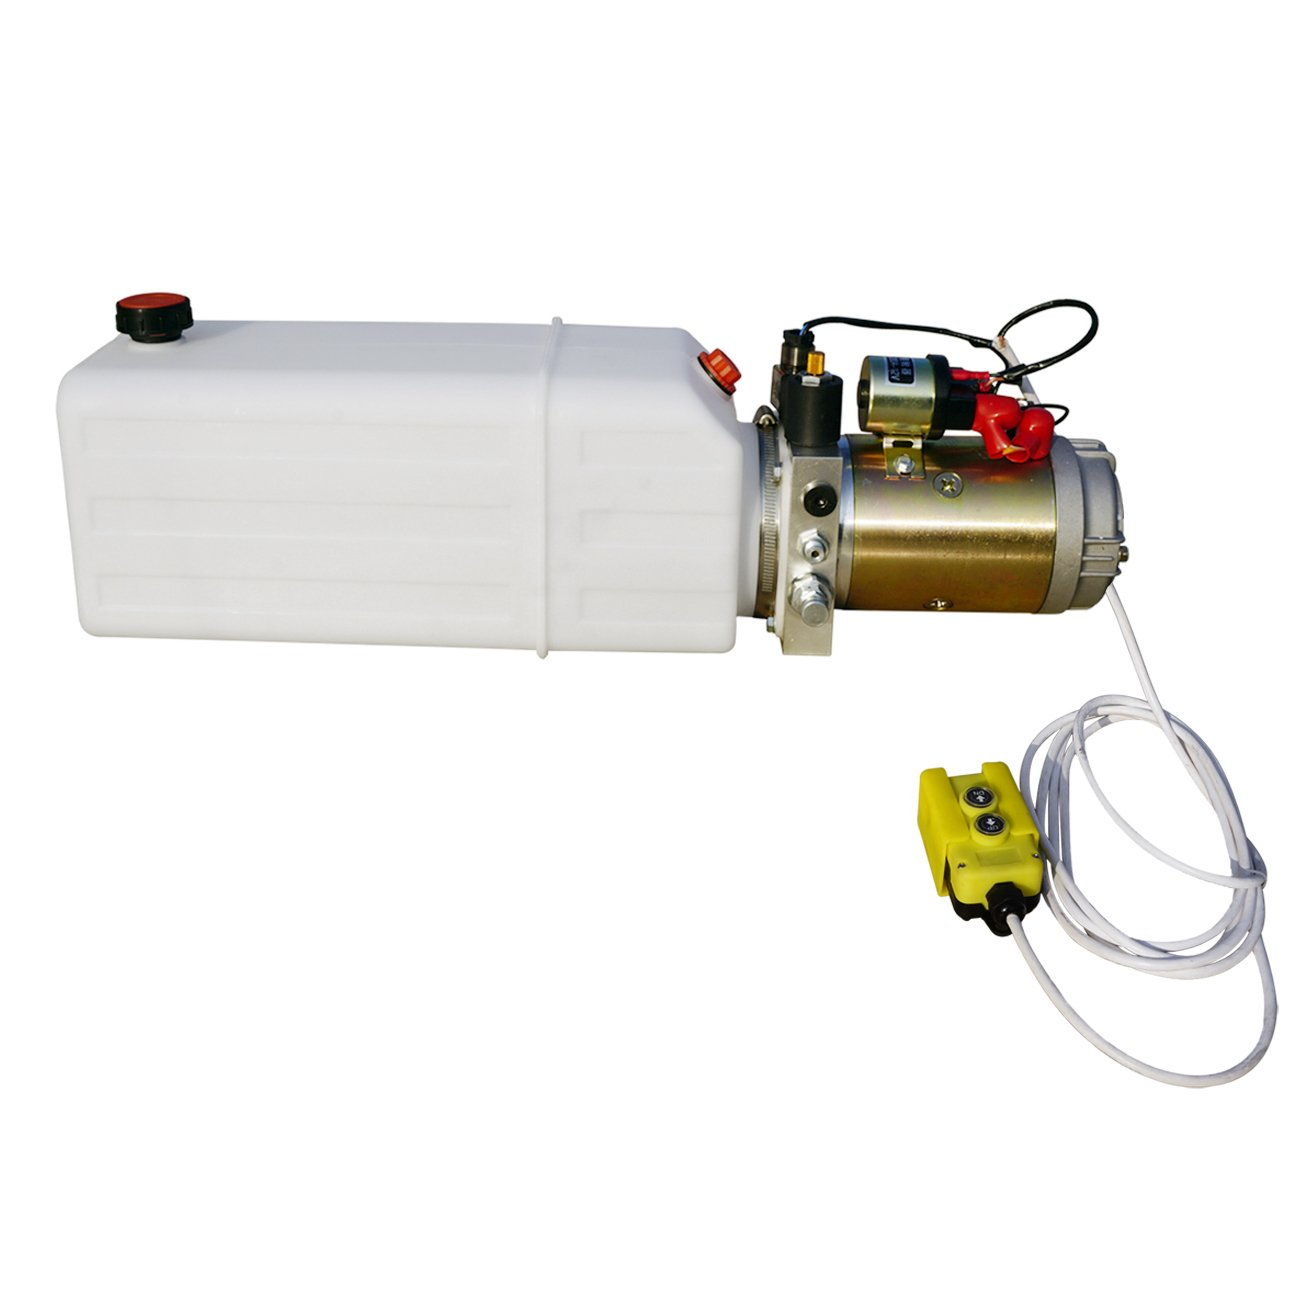 ECO-WORTHY 8 Quart 12 Volt Hydraulic Pump Power Unit Supply 3200 PSI w/ Controller Lift